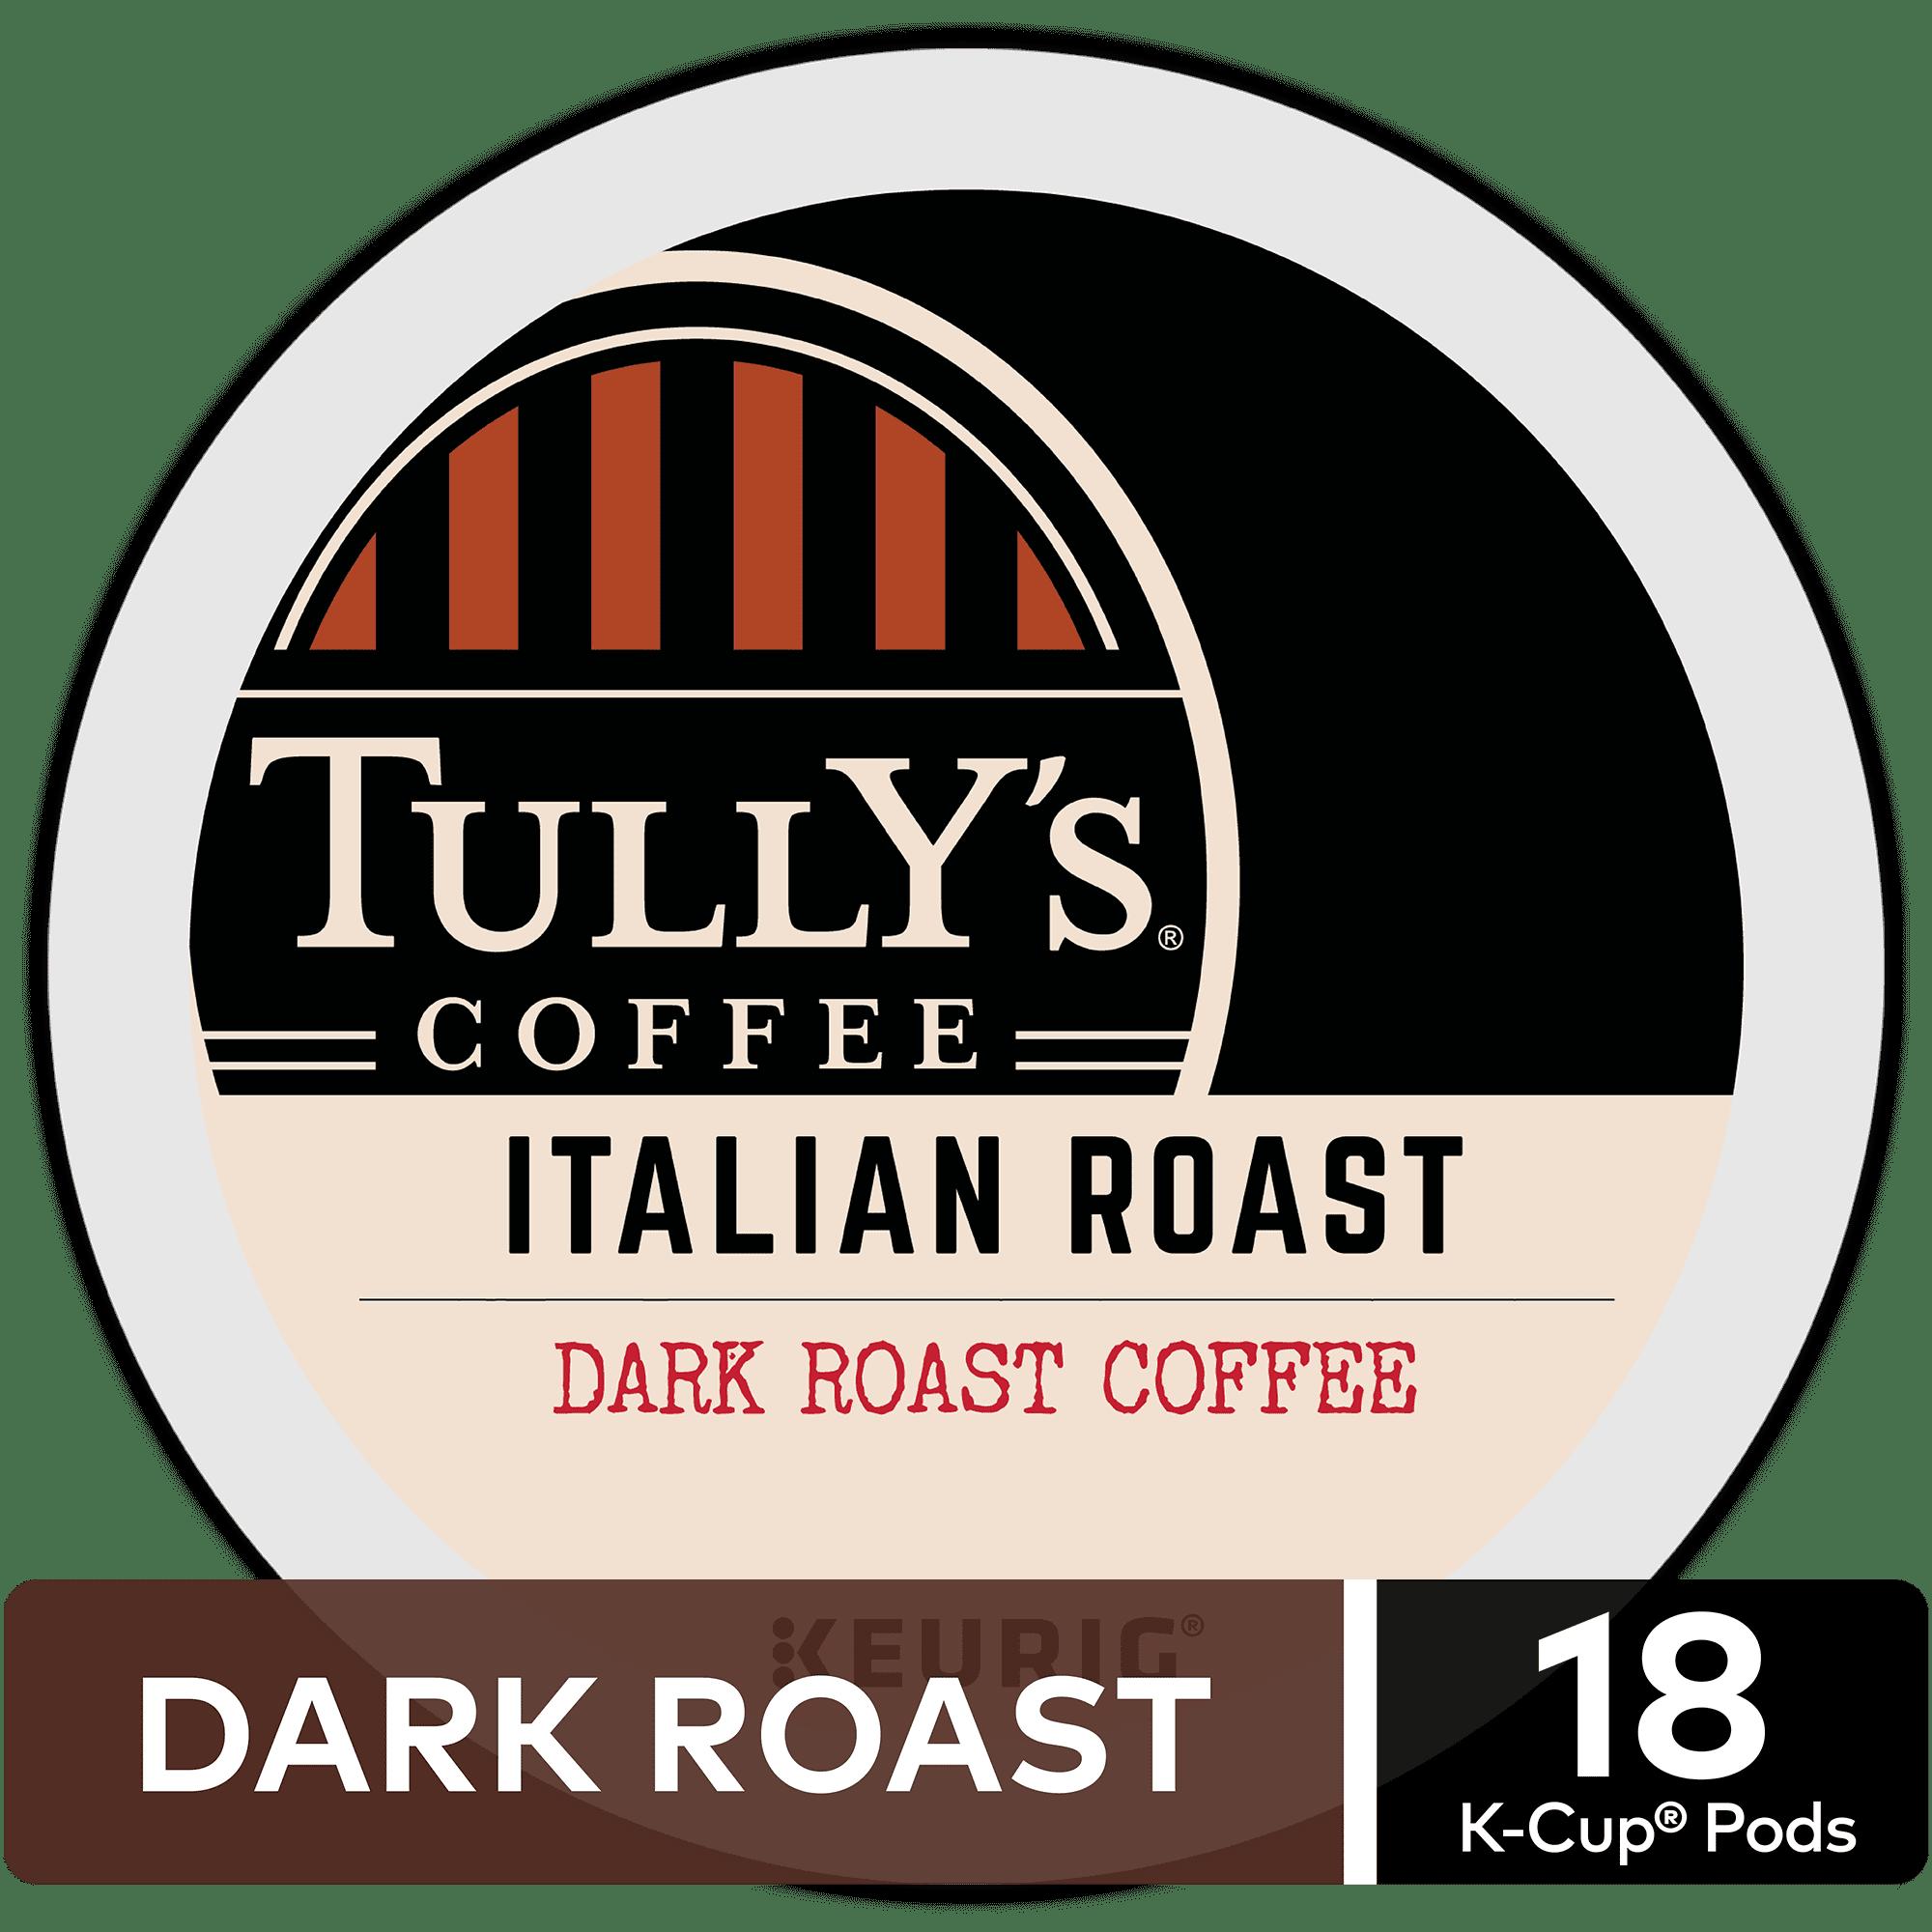 Tully's Coffee Italian Roast, Keurig K-Cup Pods, Dark Roast, 18 Count